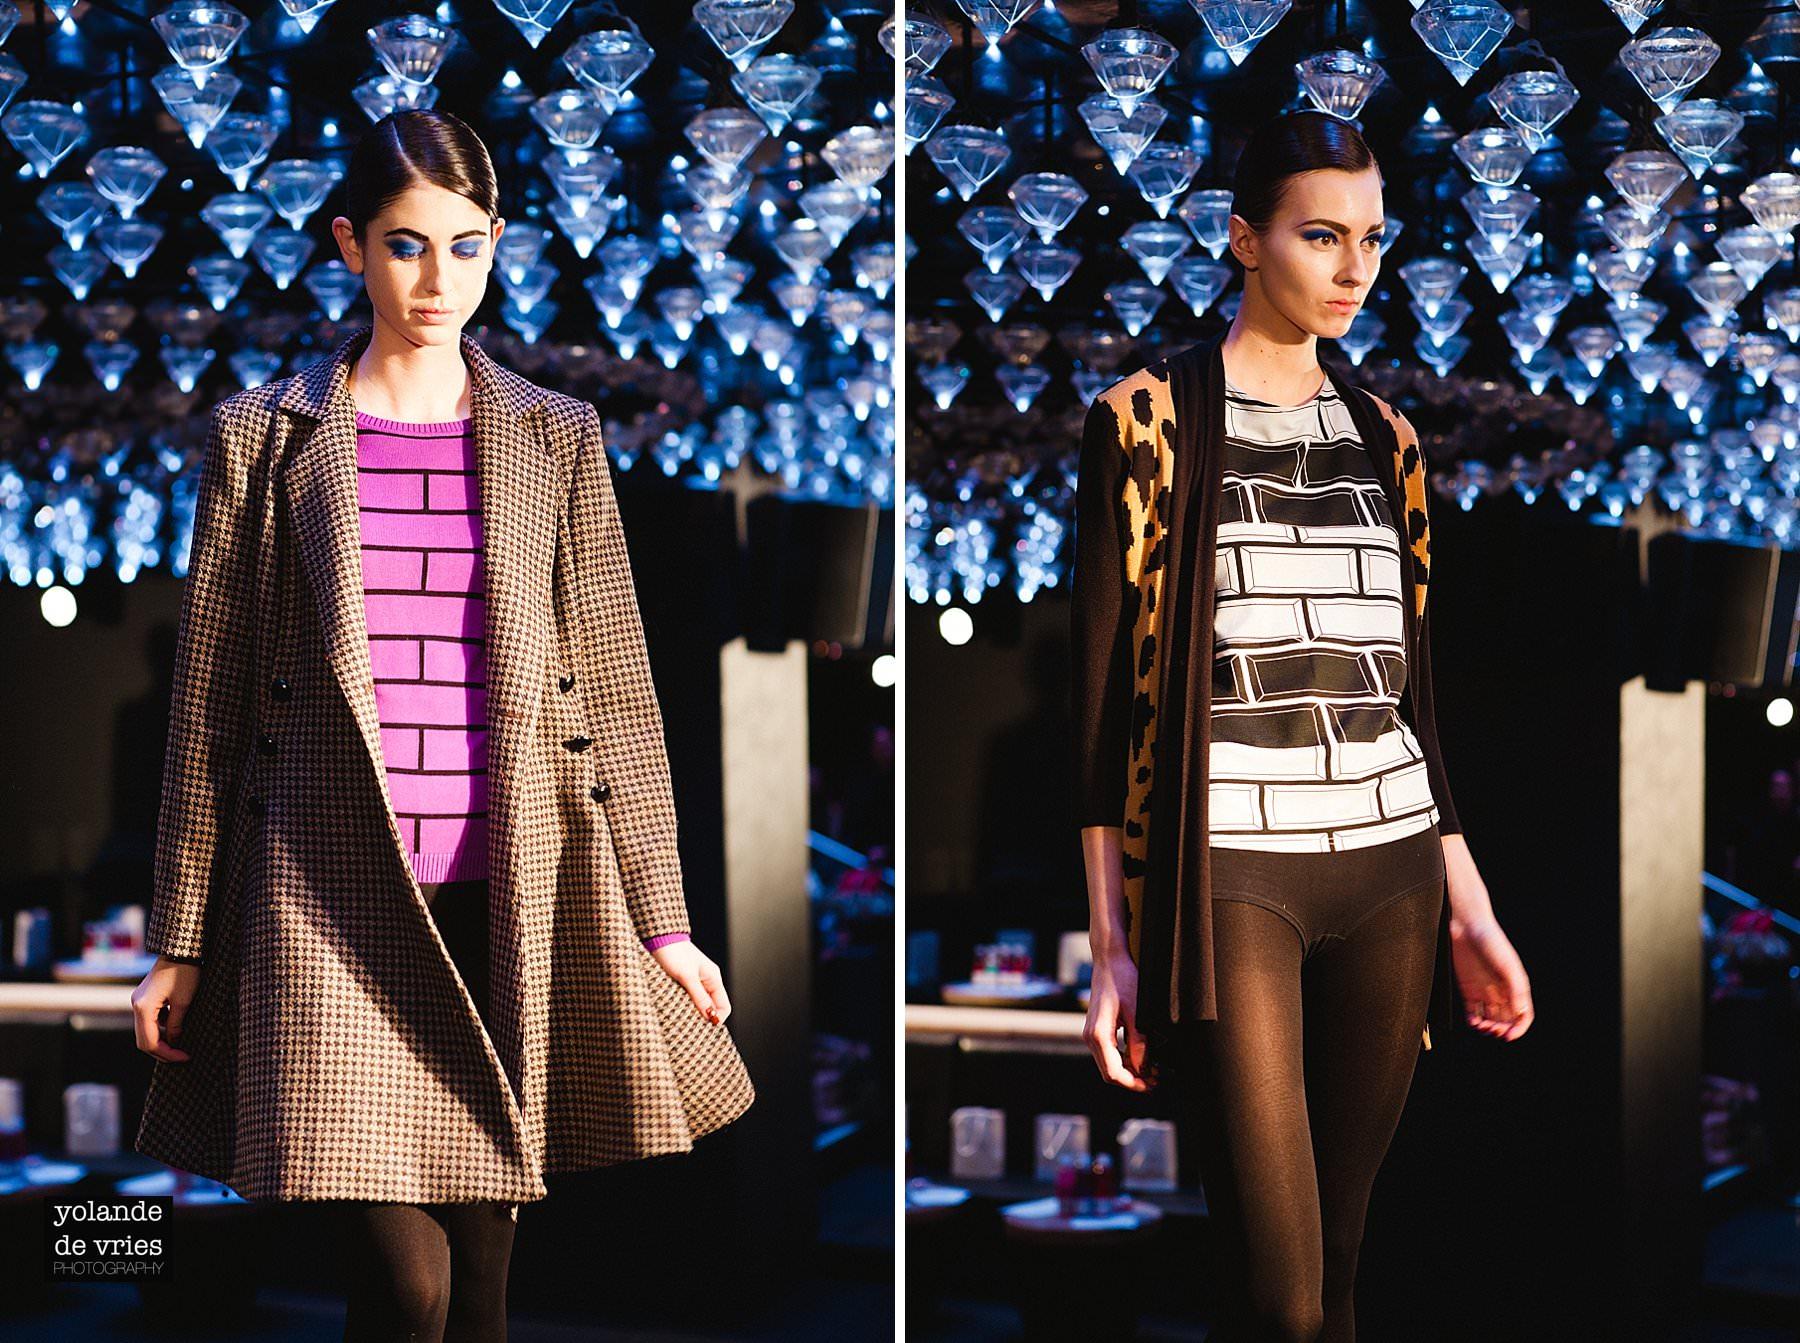 Olivia-Rubin-SS11-London-Fashion-Week-1514.jpg